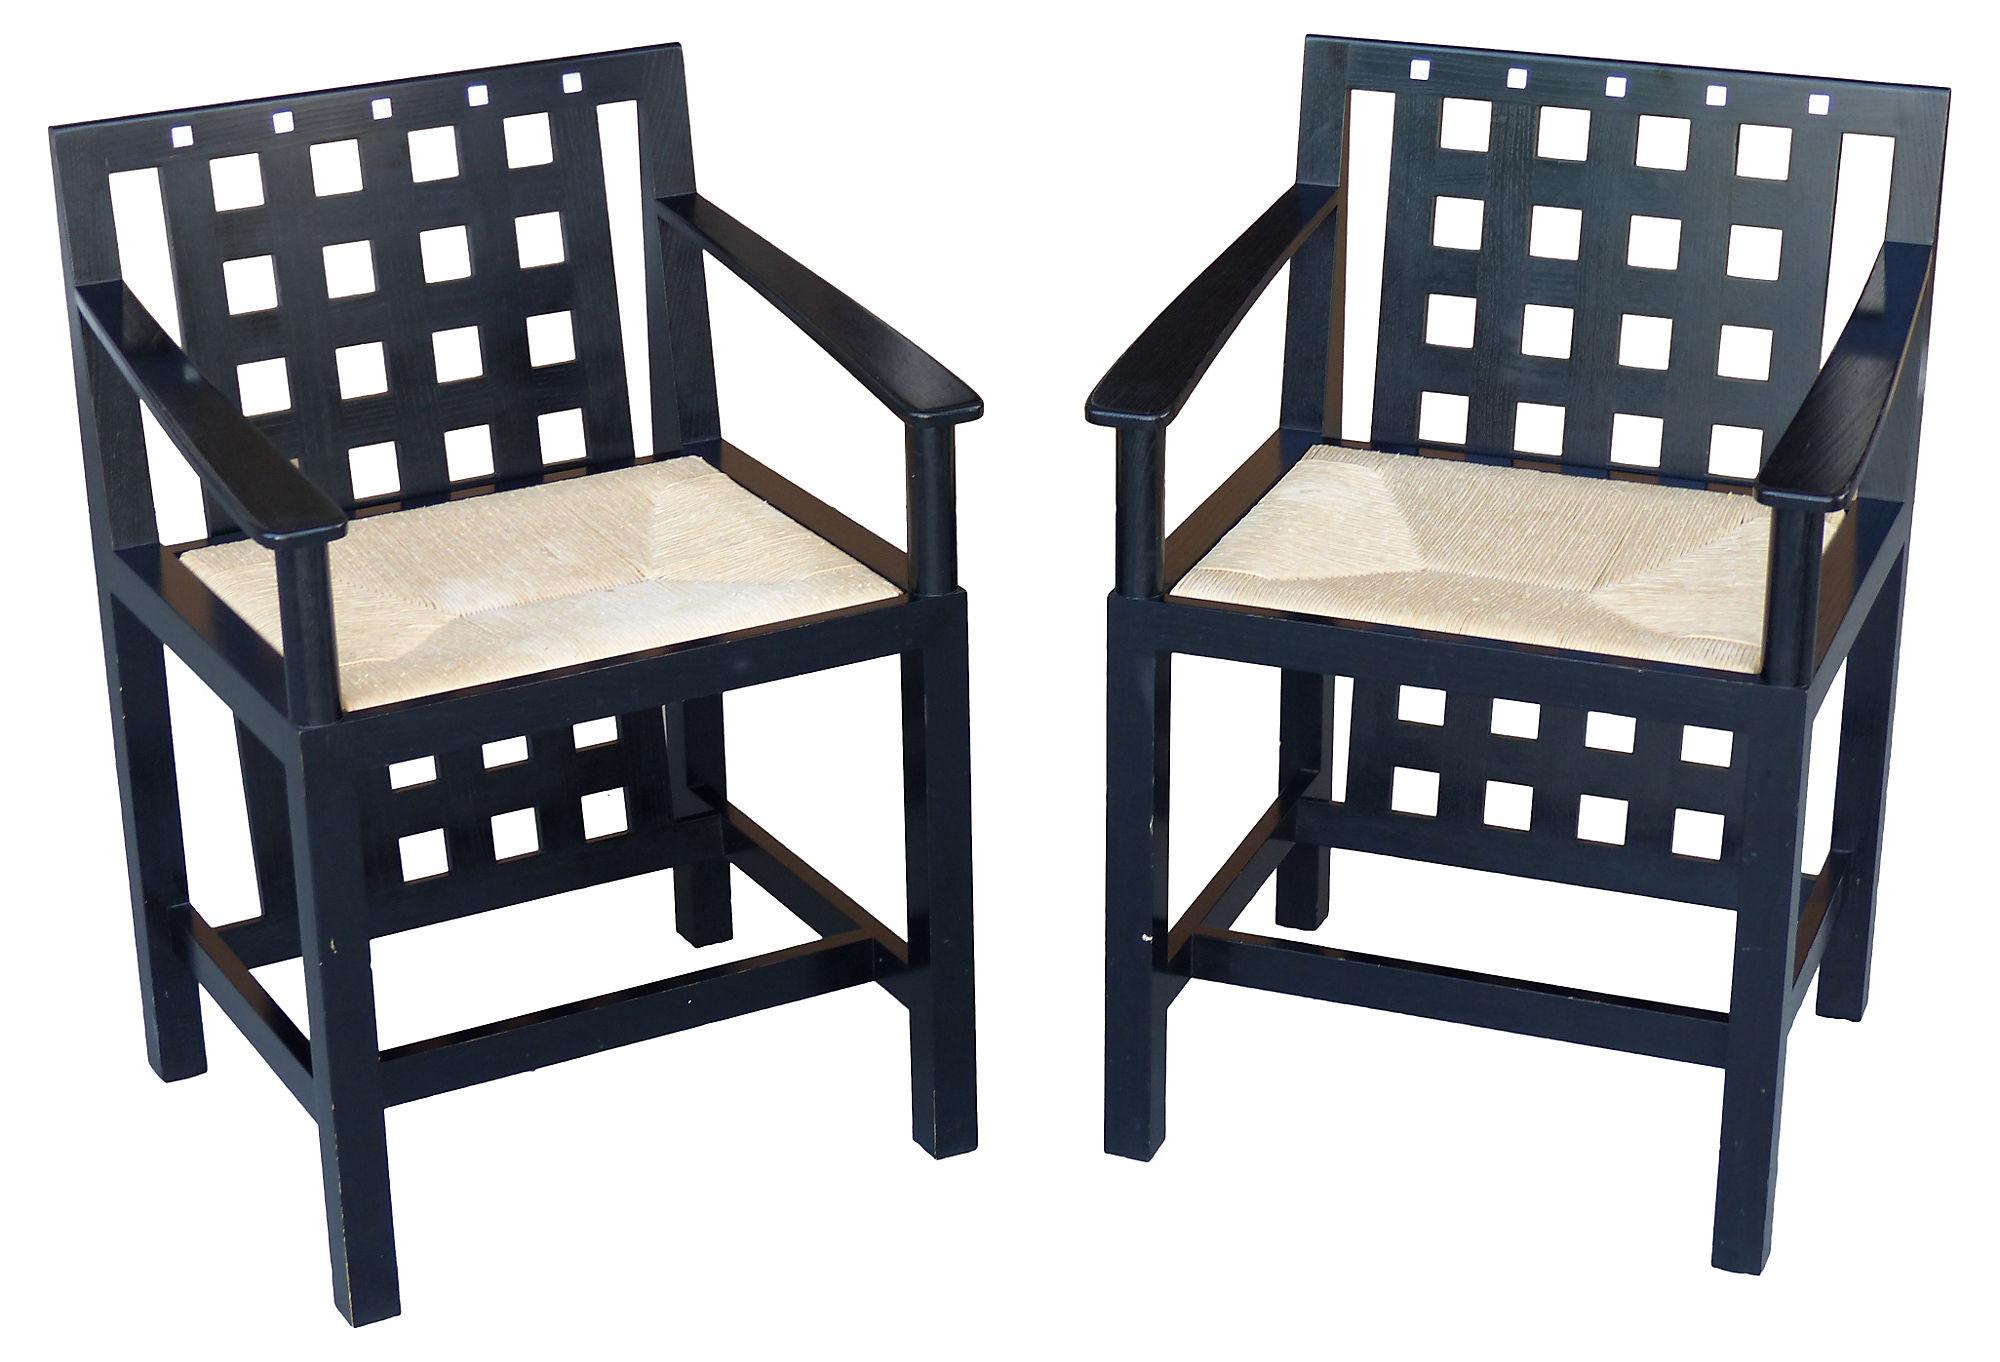 charles rennie mackintosh willow chair ergonomic gaming reddit mackinstosh ds3 chairs 1975 modernism